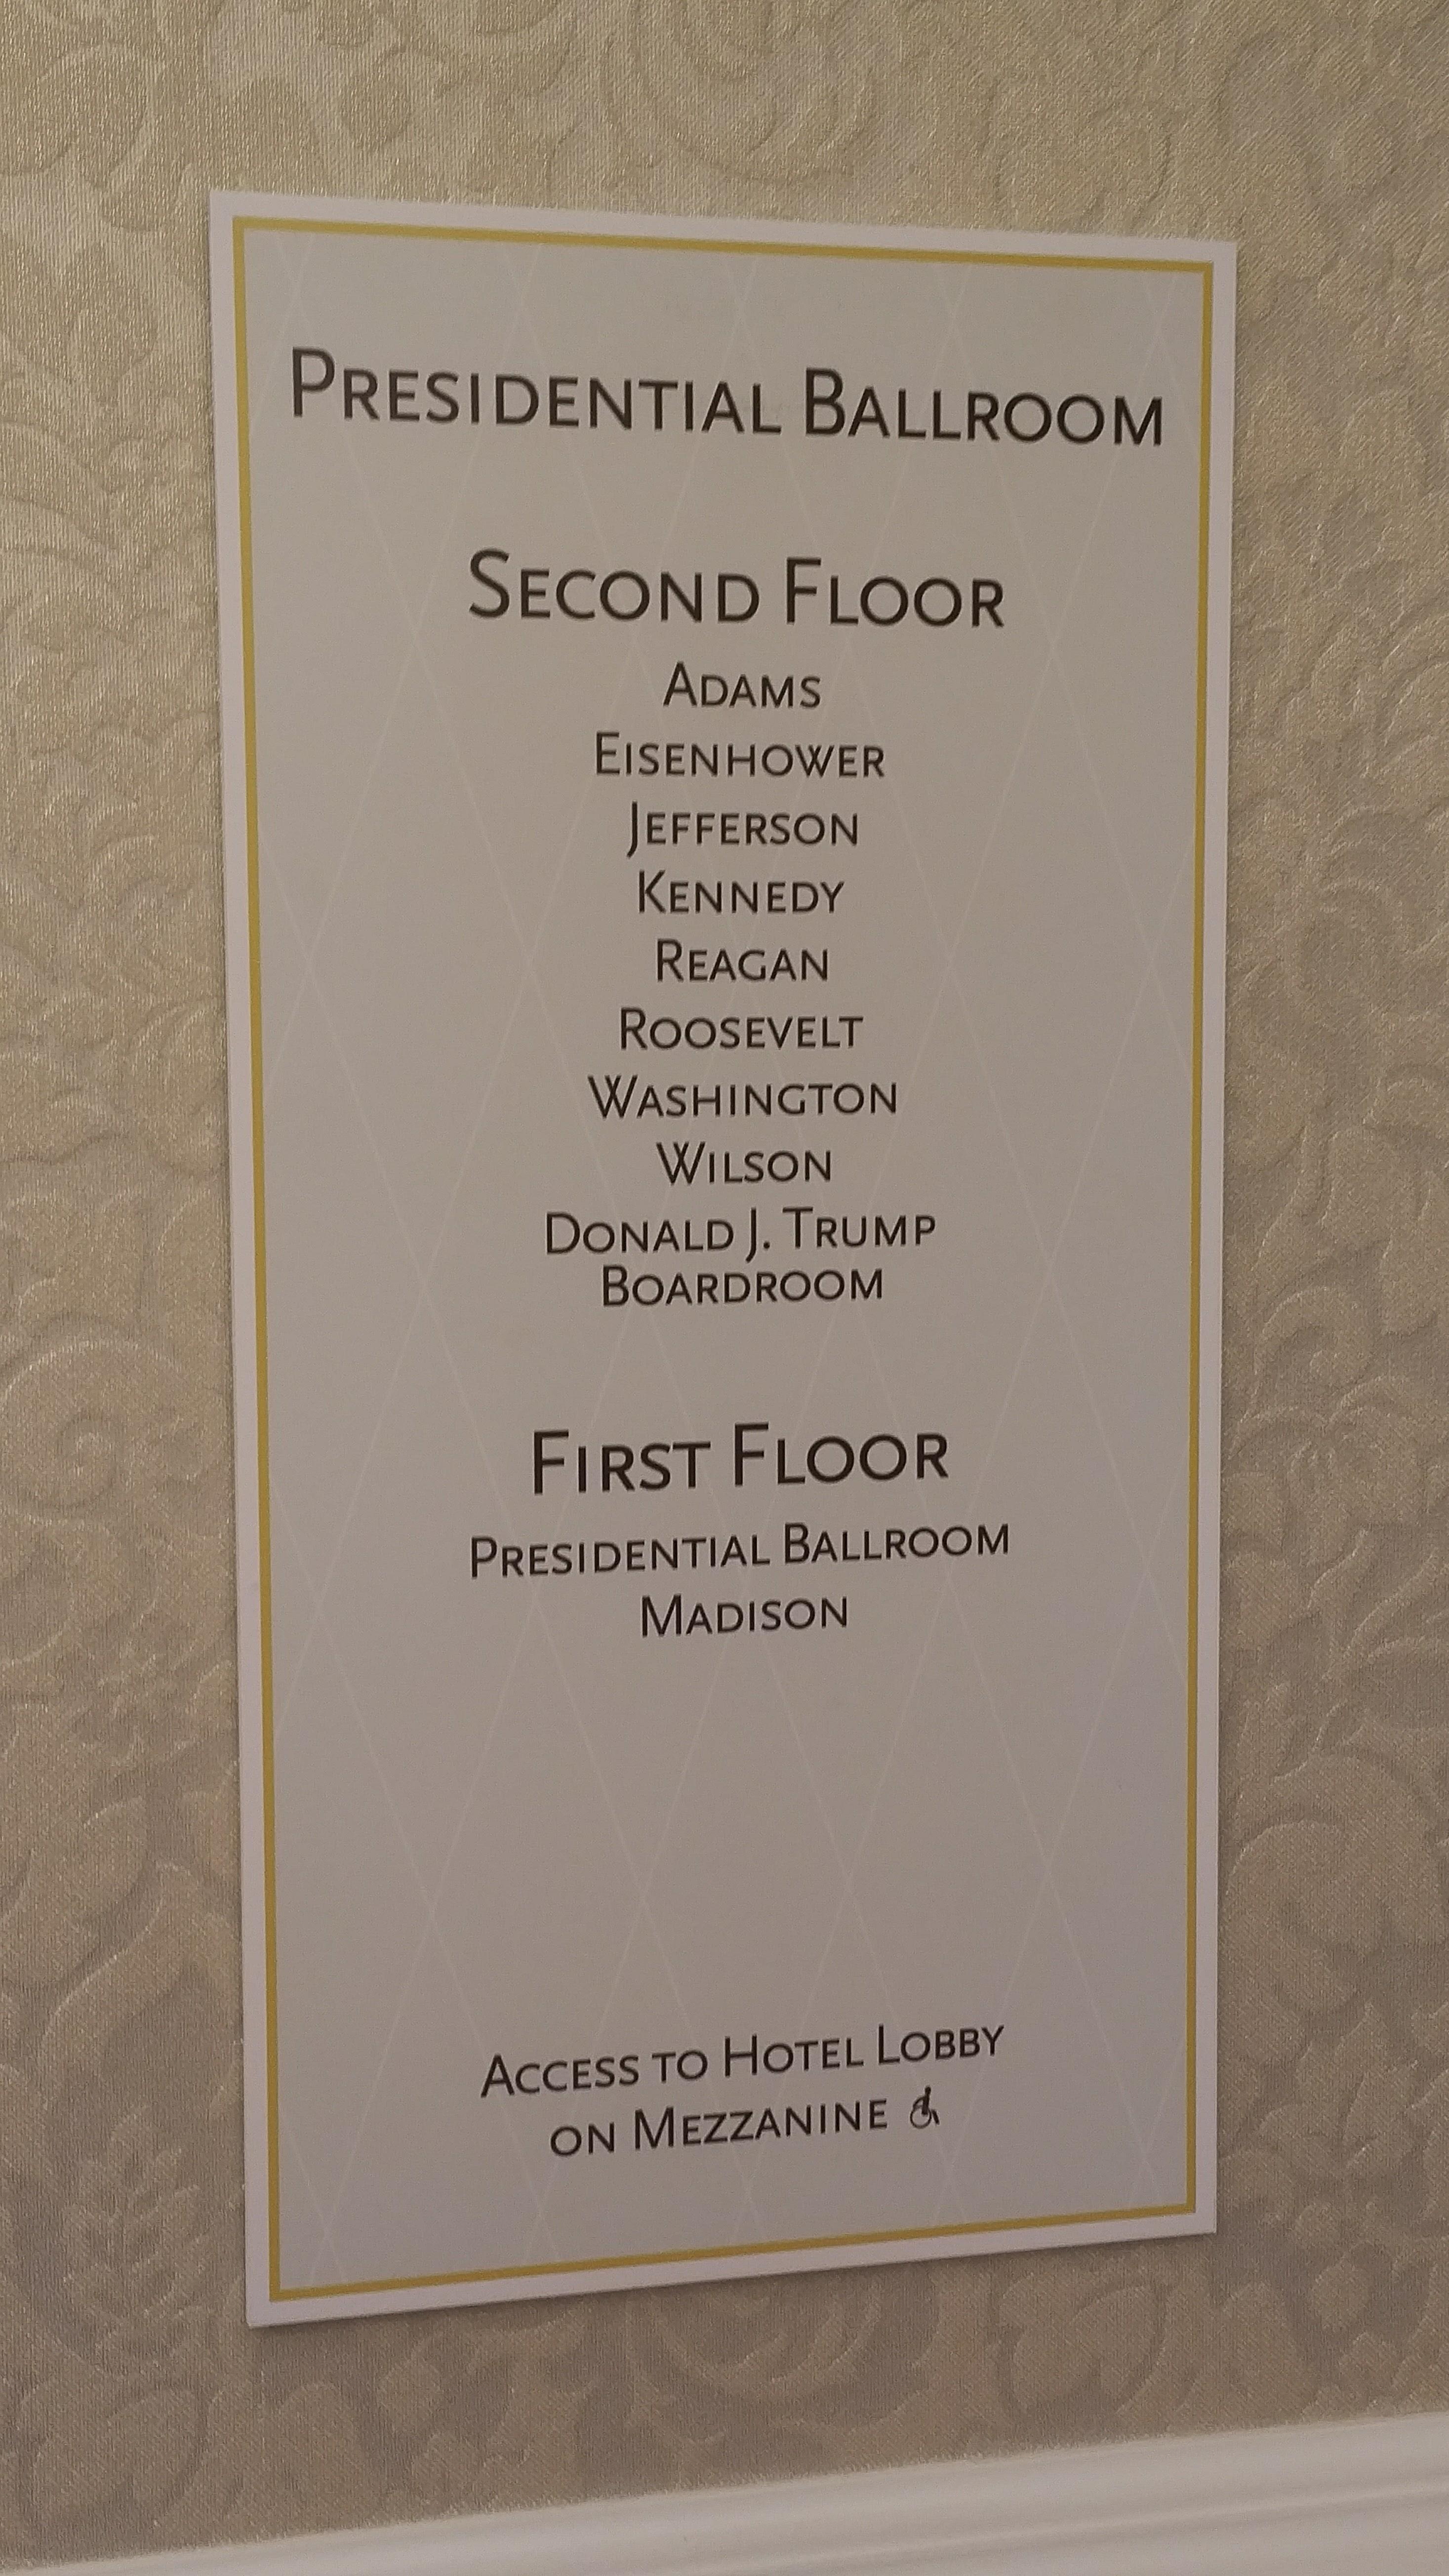 Directory for Trump International Hotel ballrooms